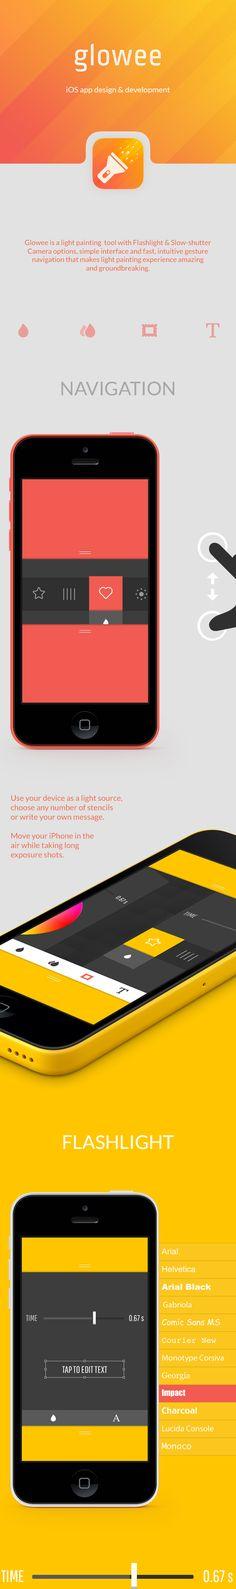 Glowee iOS app on Behance Mobile Ui Design, App Ui Design, User Interface Design, Flat Design, Wireframe, Apps, Paint App, Smartphone, Branding